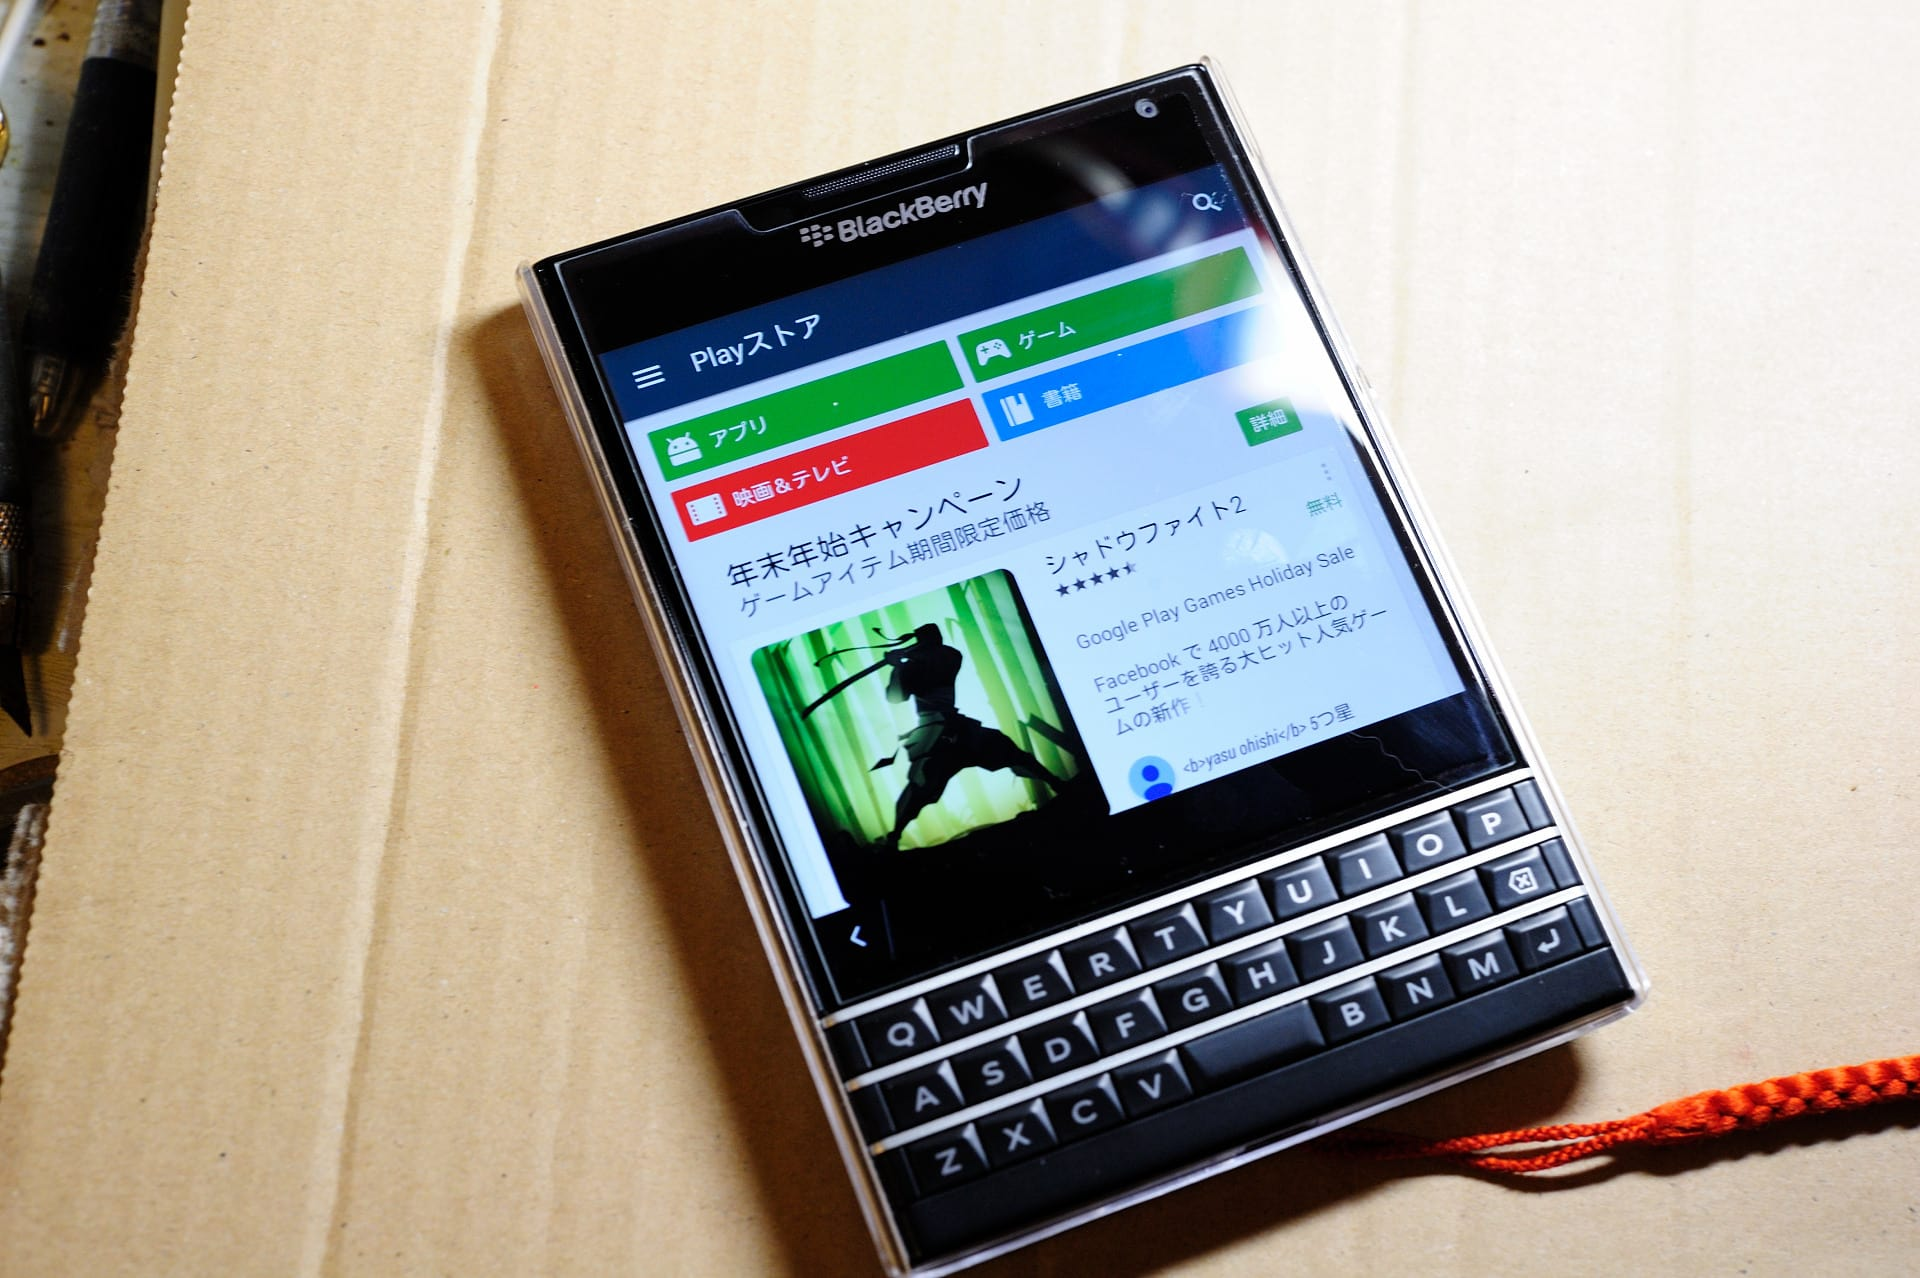 Download google play store for blackberry passport